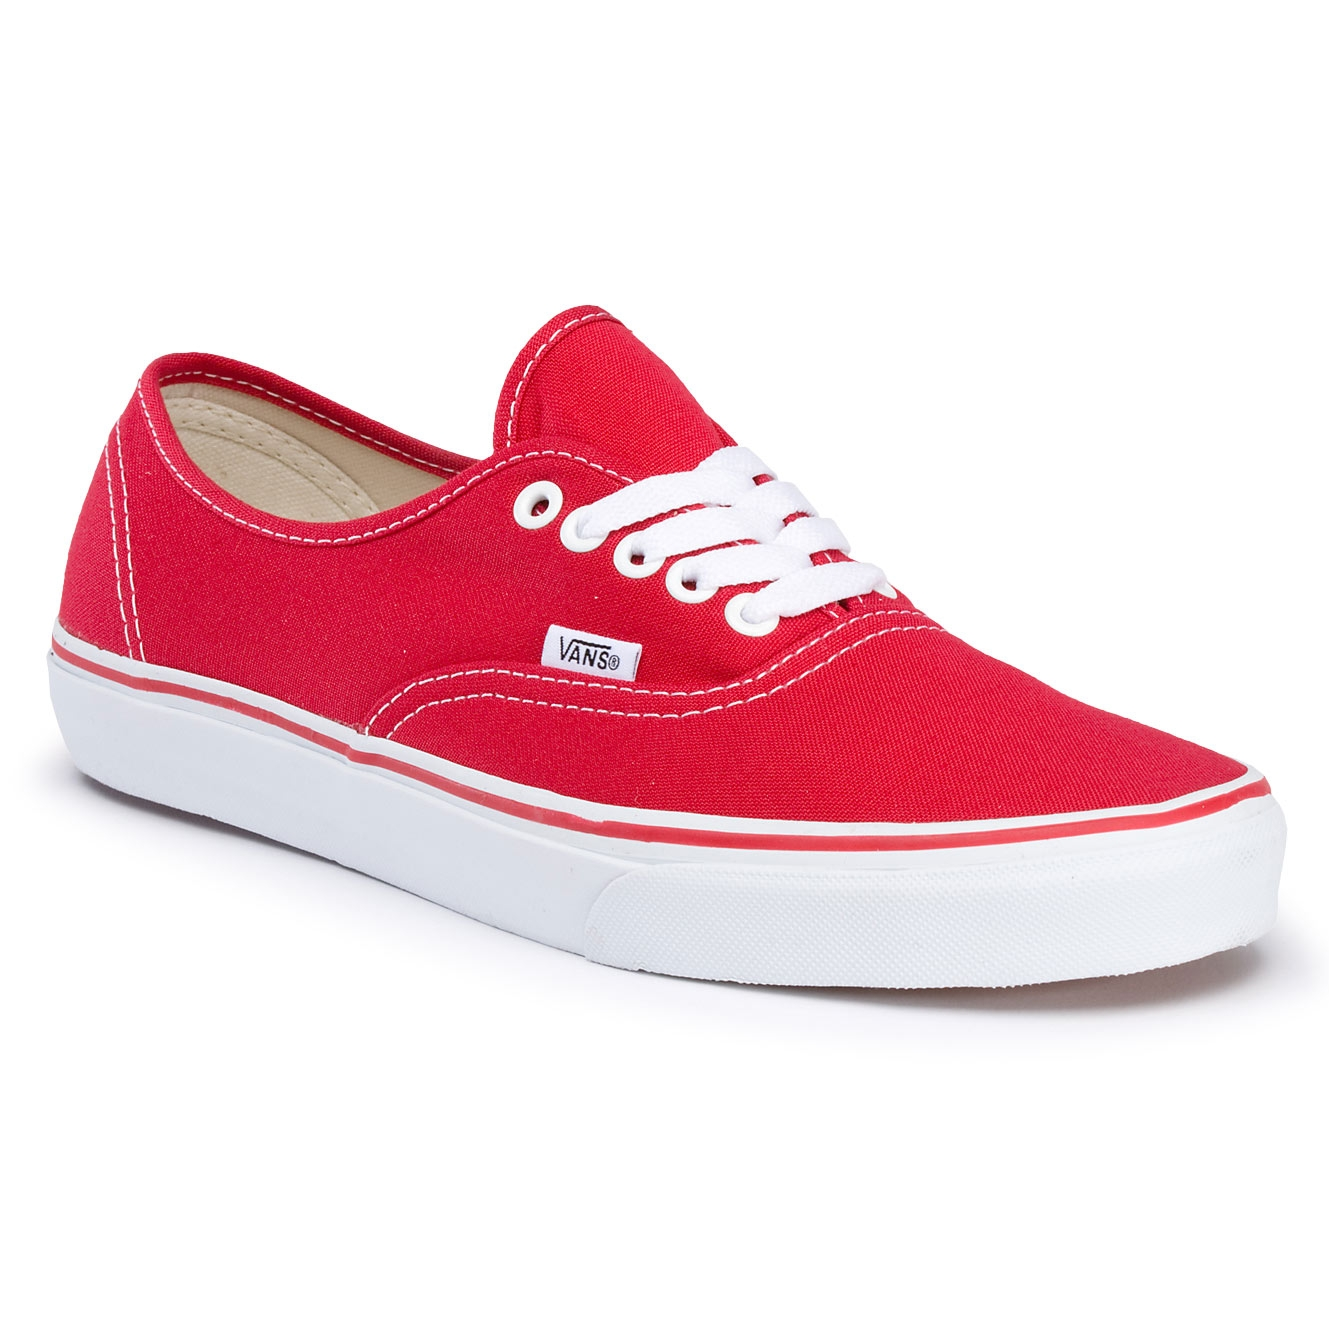 Vans authentic red tubede - d7308